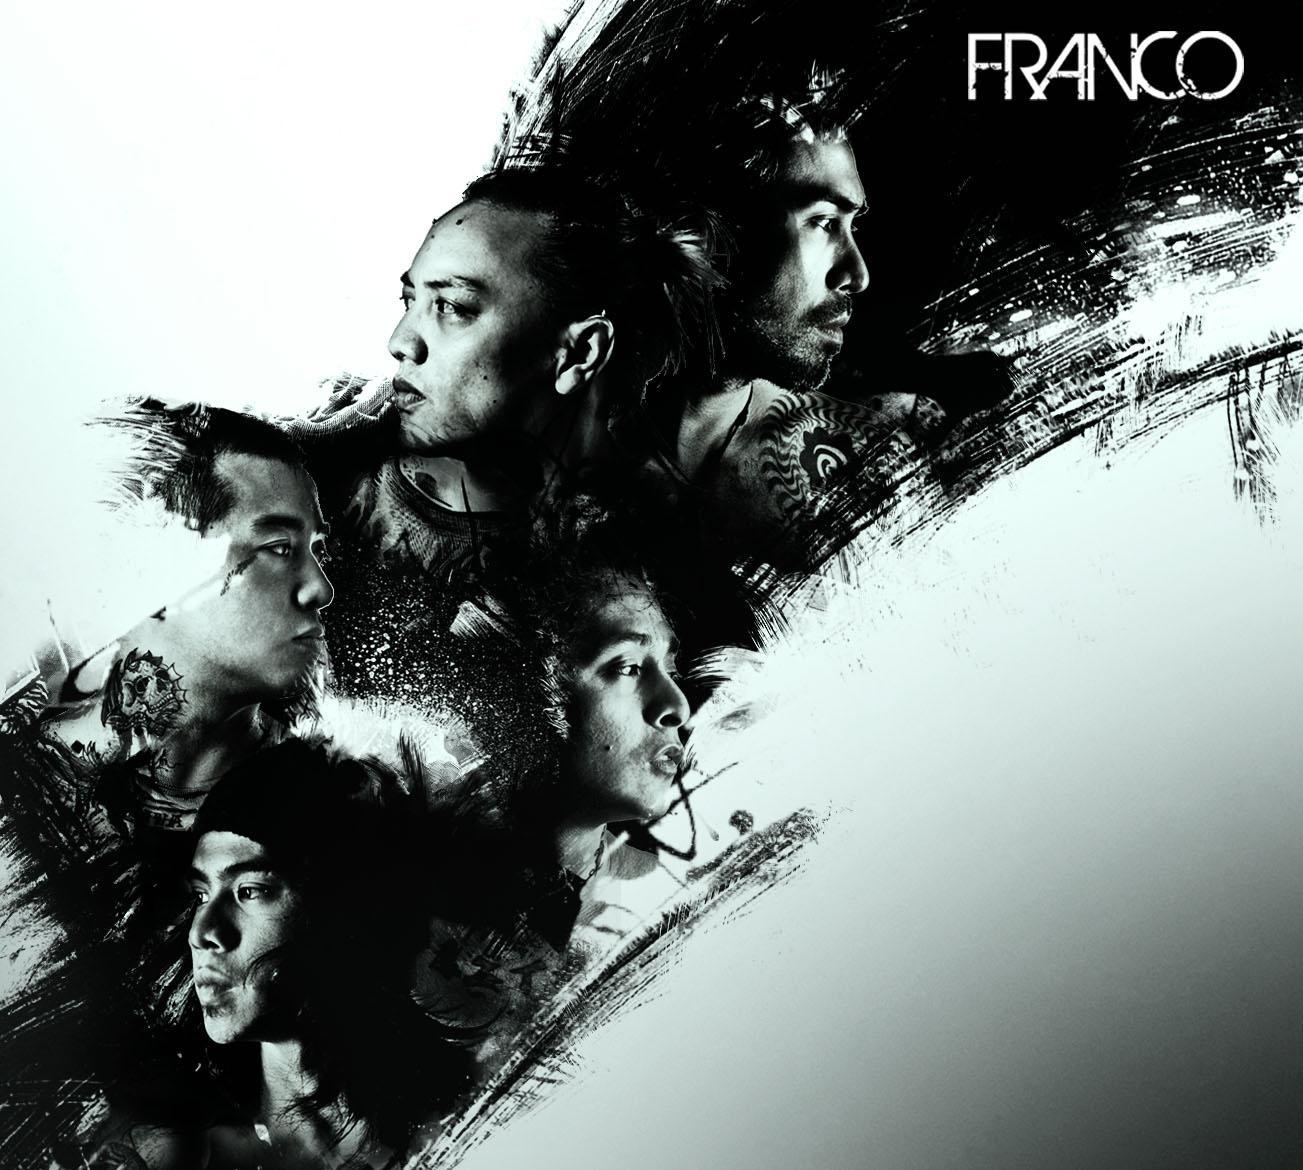 http://2.bp.blogspot.com/_r10R8SBziiM/TQ2sc6srjzI/AAAAAAAAAAM/5TB8vMv4y3E/s1600/Franco-Album-Cover3.jpg